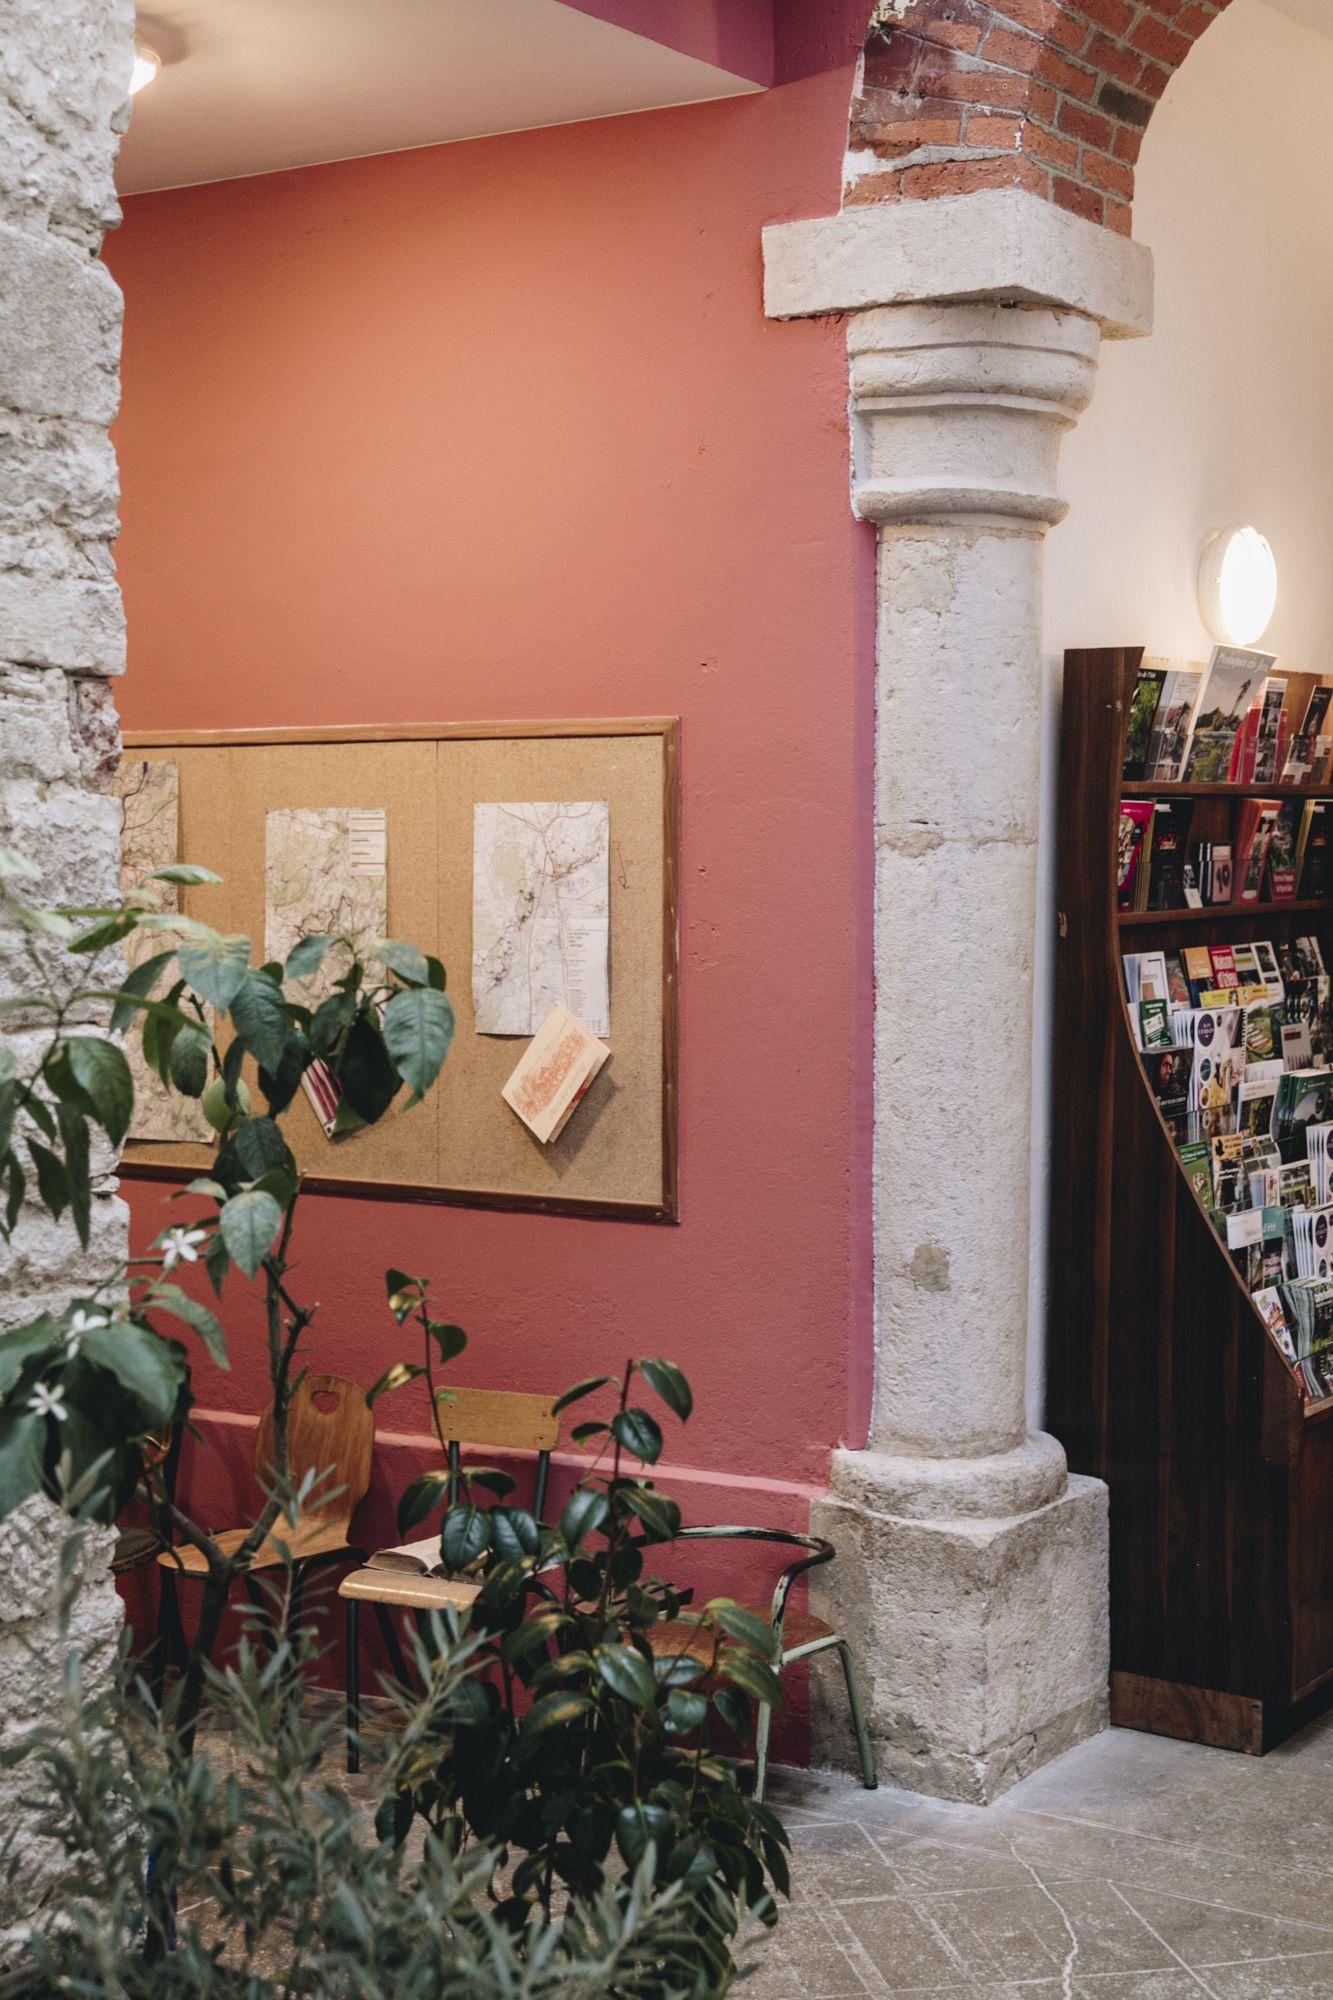 La Maison D Ambronay Rhone Alpes Ain En 2020 Gite Chambre D Hote Chambre Hote Charme